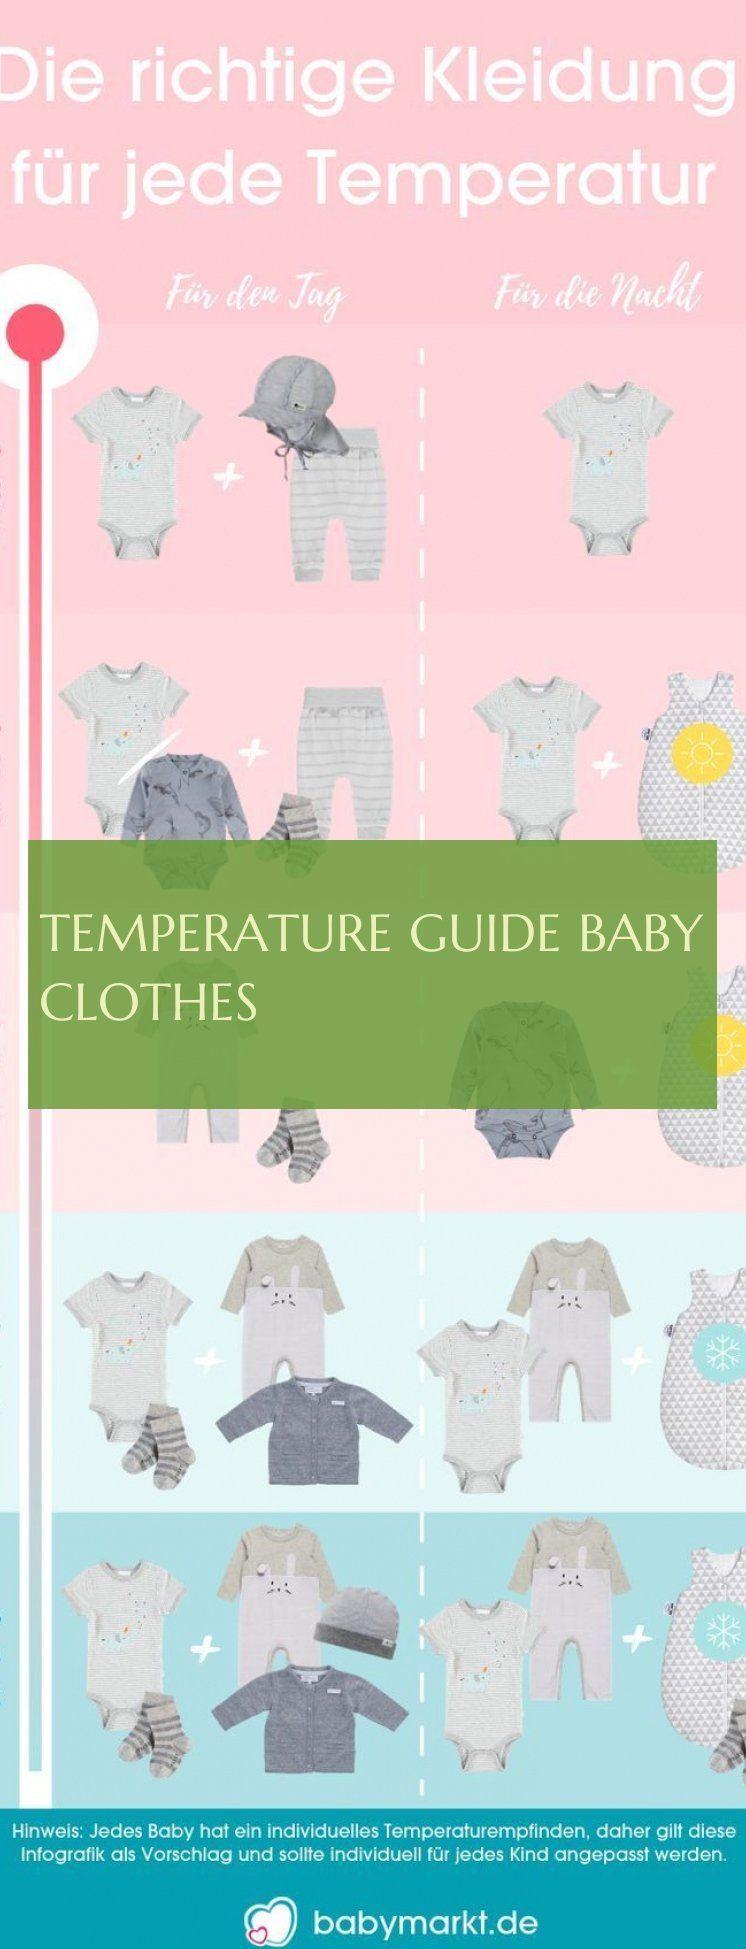 temperature guide baby clothes ; temperaturführer